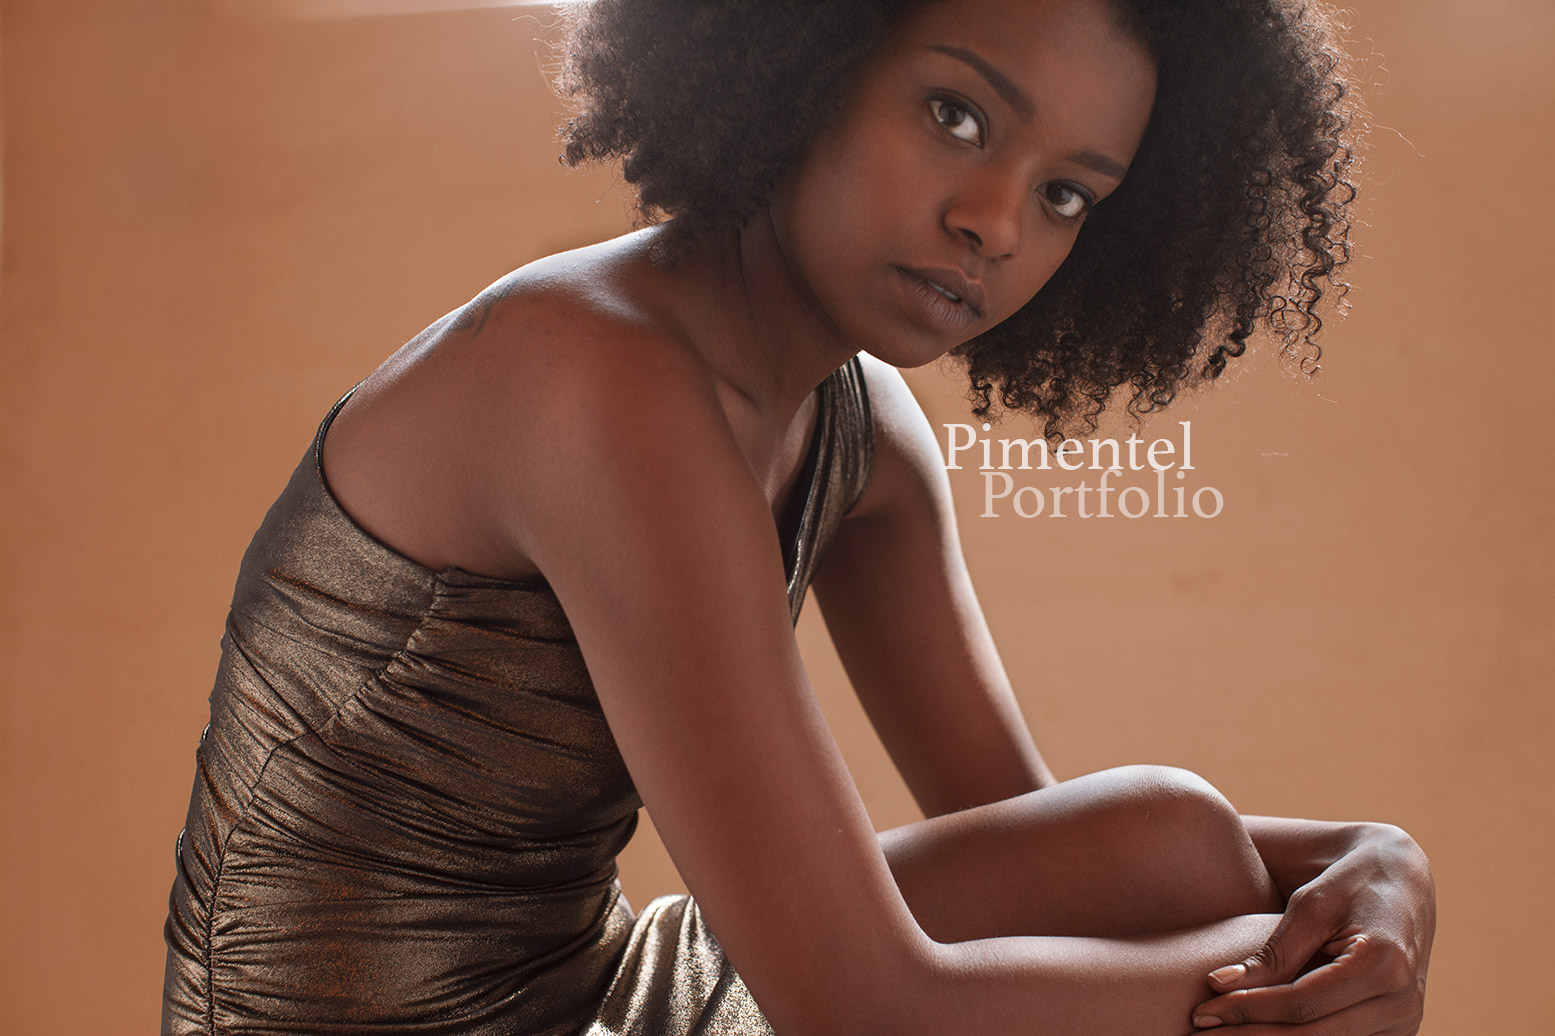 Portraiture by Pimentel Portfolio LLC